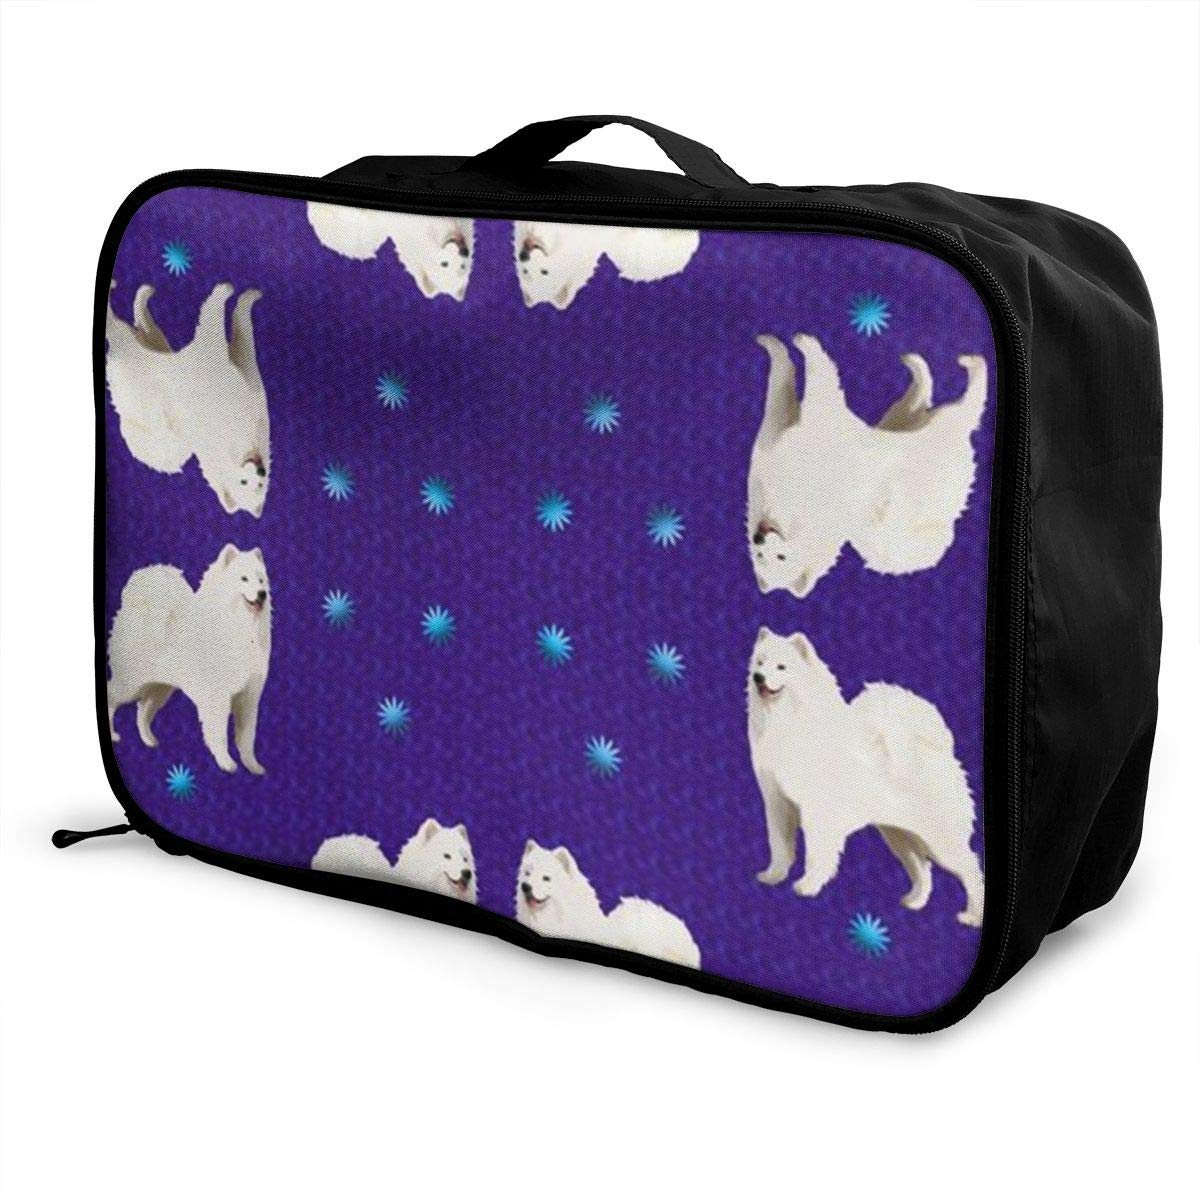 ADGAI Samoyed Purple with Stars Canvas Travel Weekender Bag,Fashion Custom Lightweight Large Capacity Portable Luggage Bag,Suitcase Trolley Bag